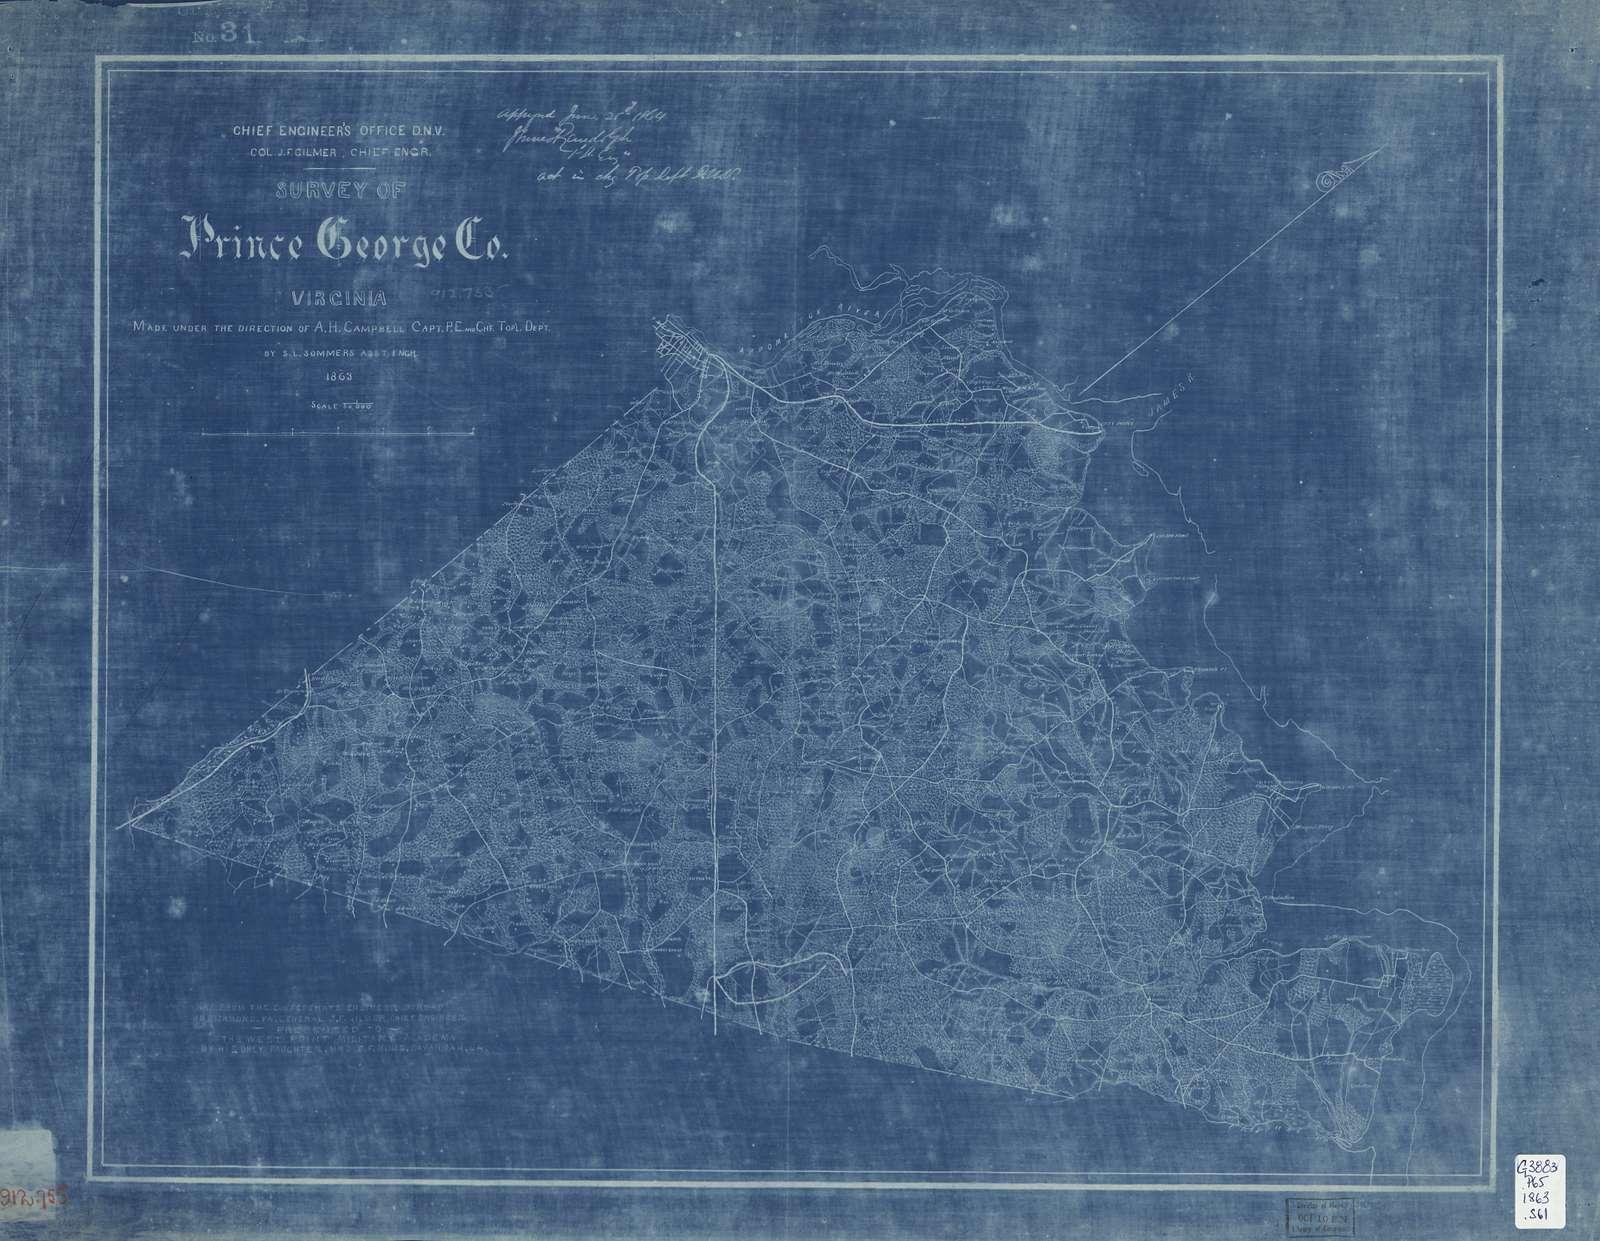 Survey of Prince George Co., Virginia /